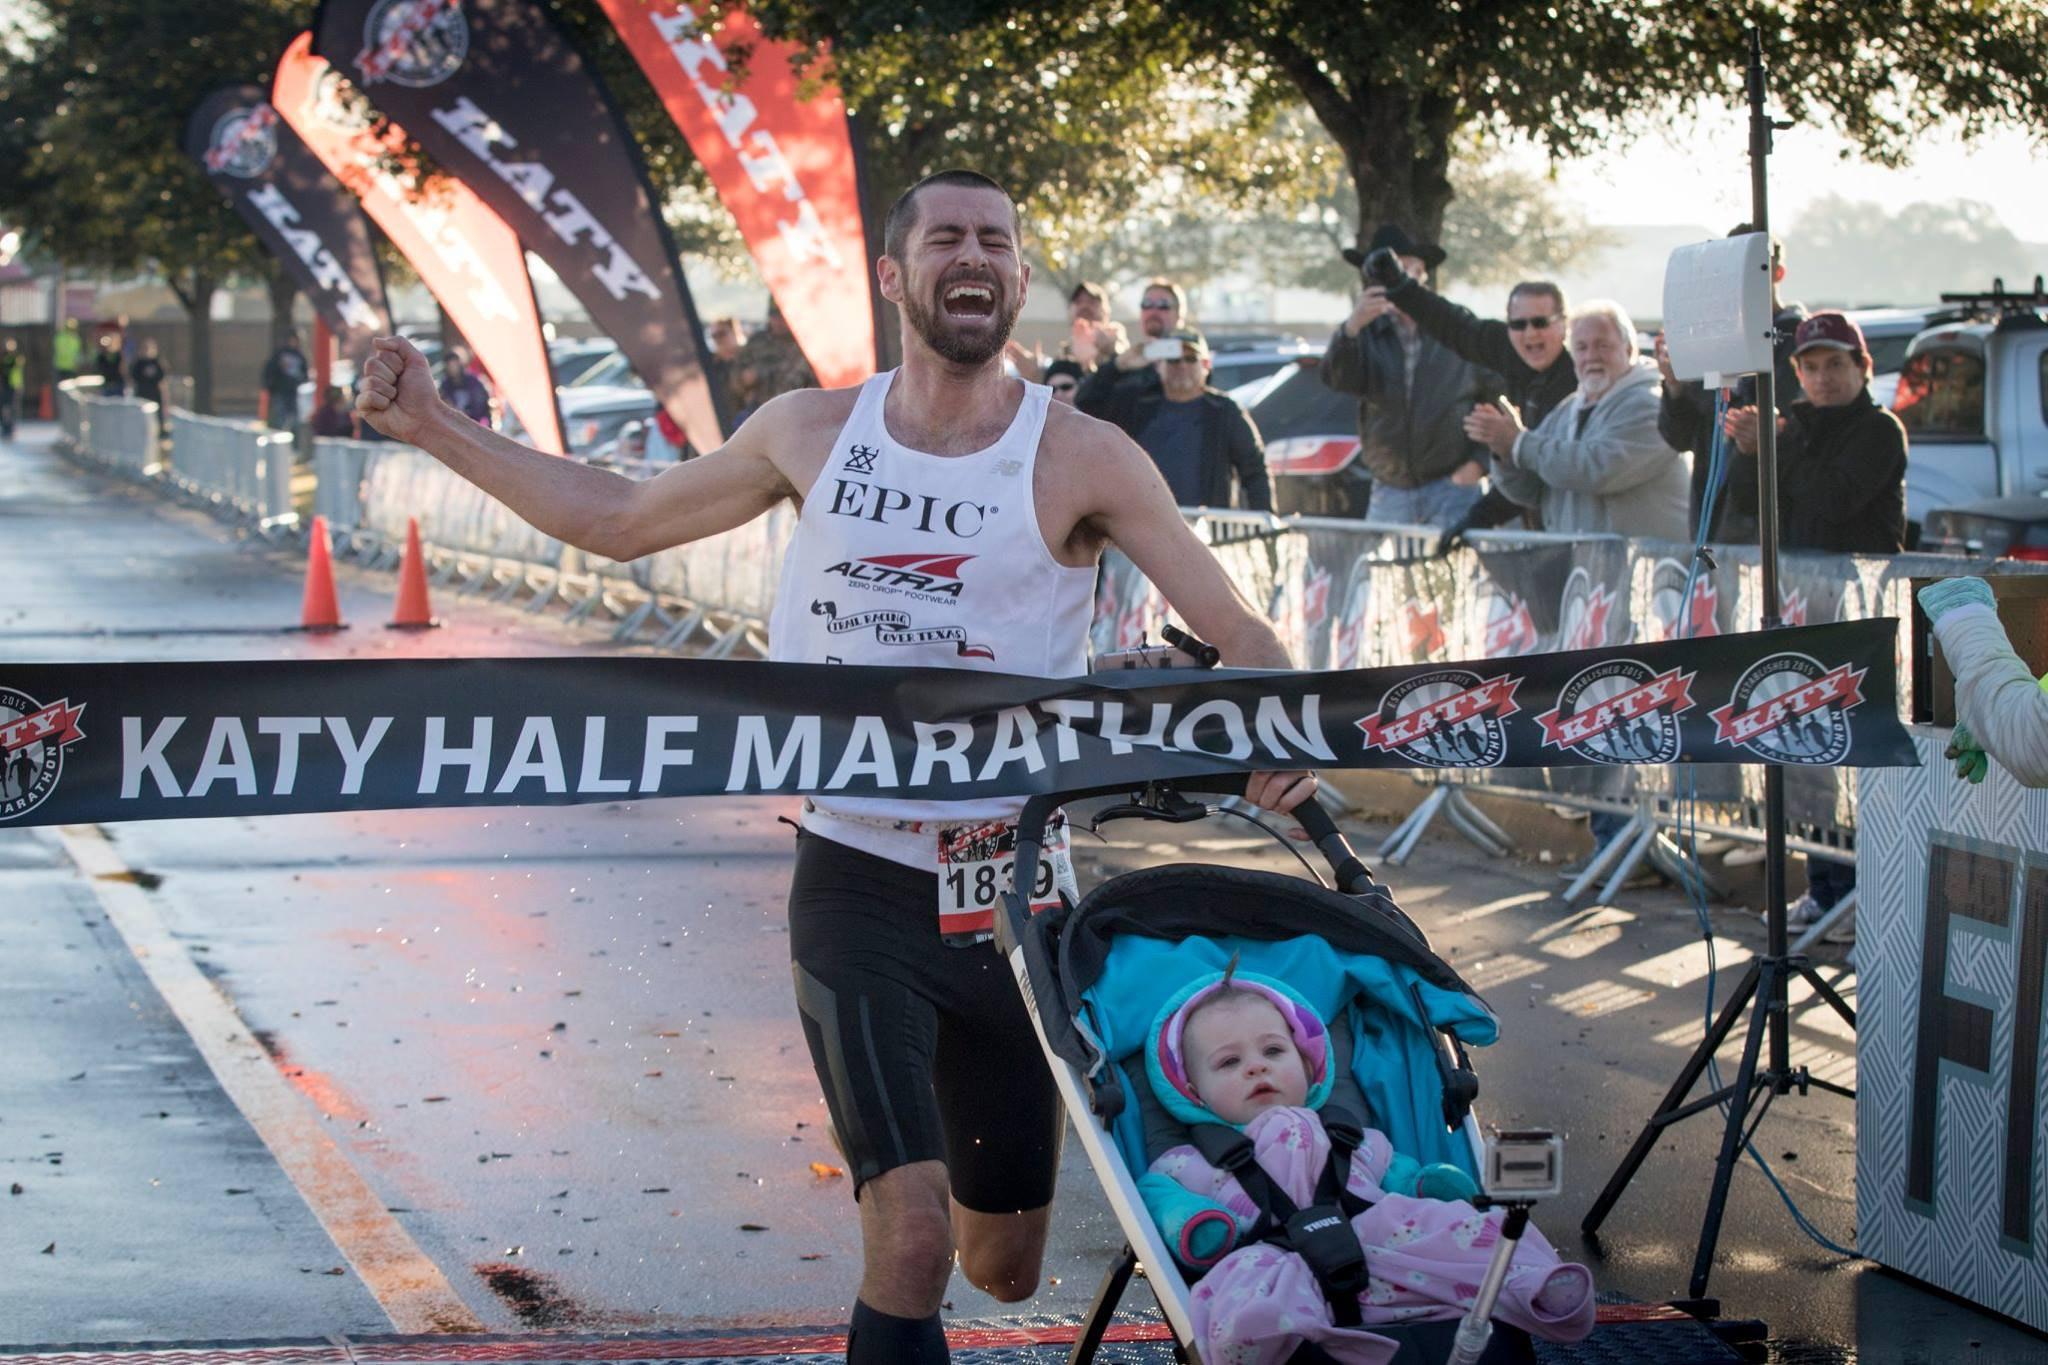 verdensrekord halvmarathon